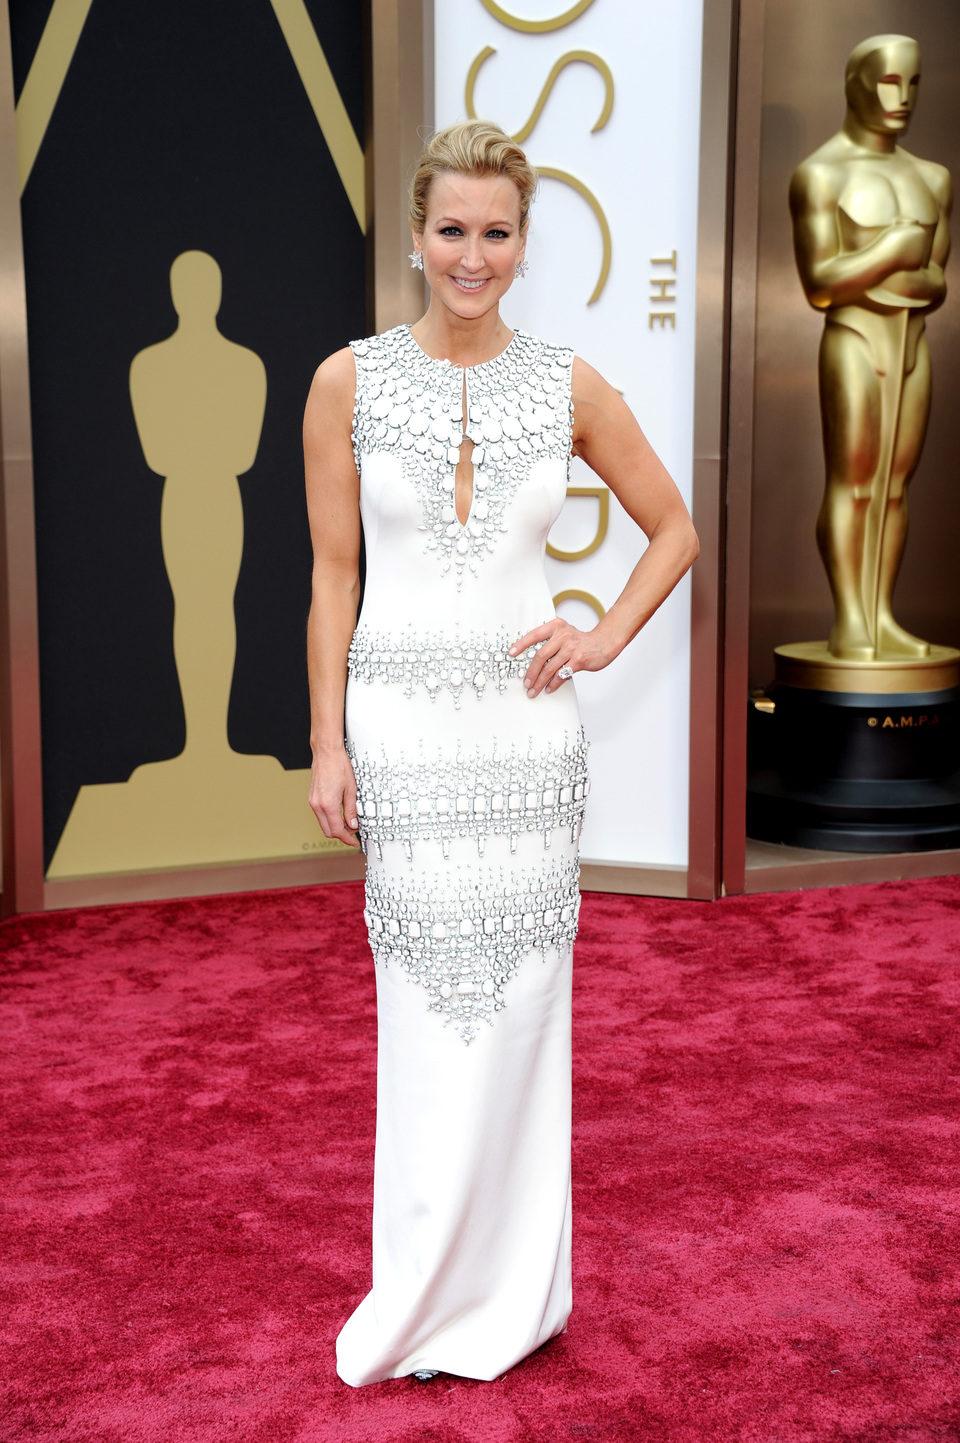 Lara Spencer at the 2014 Oscars